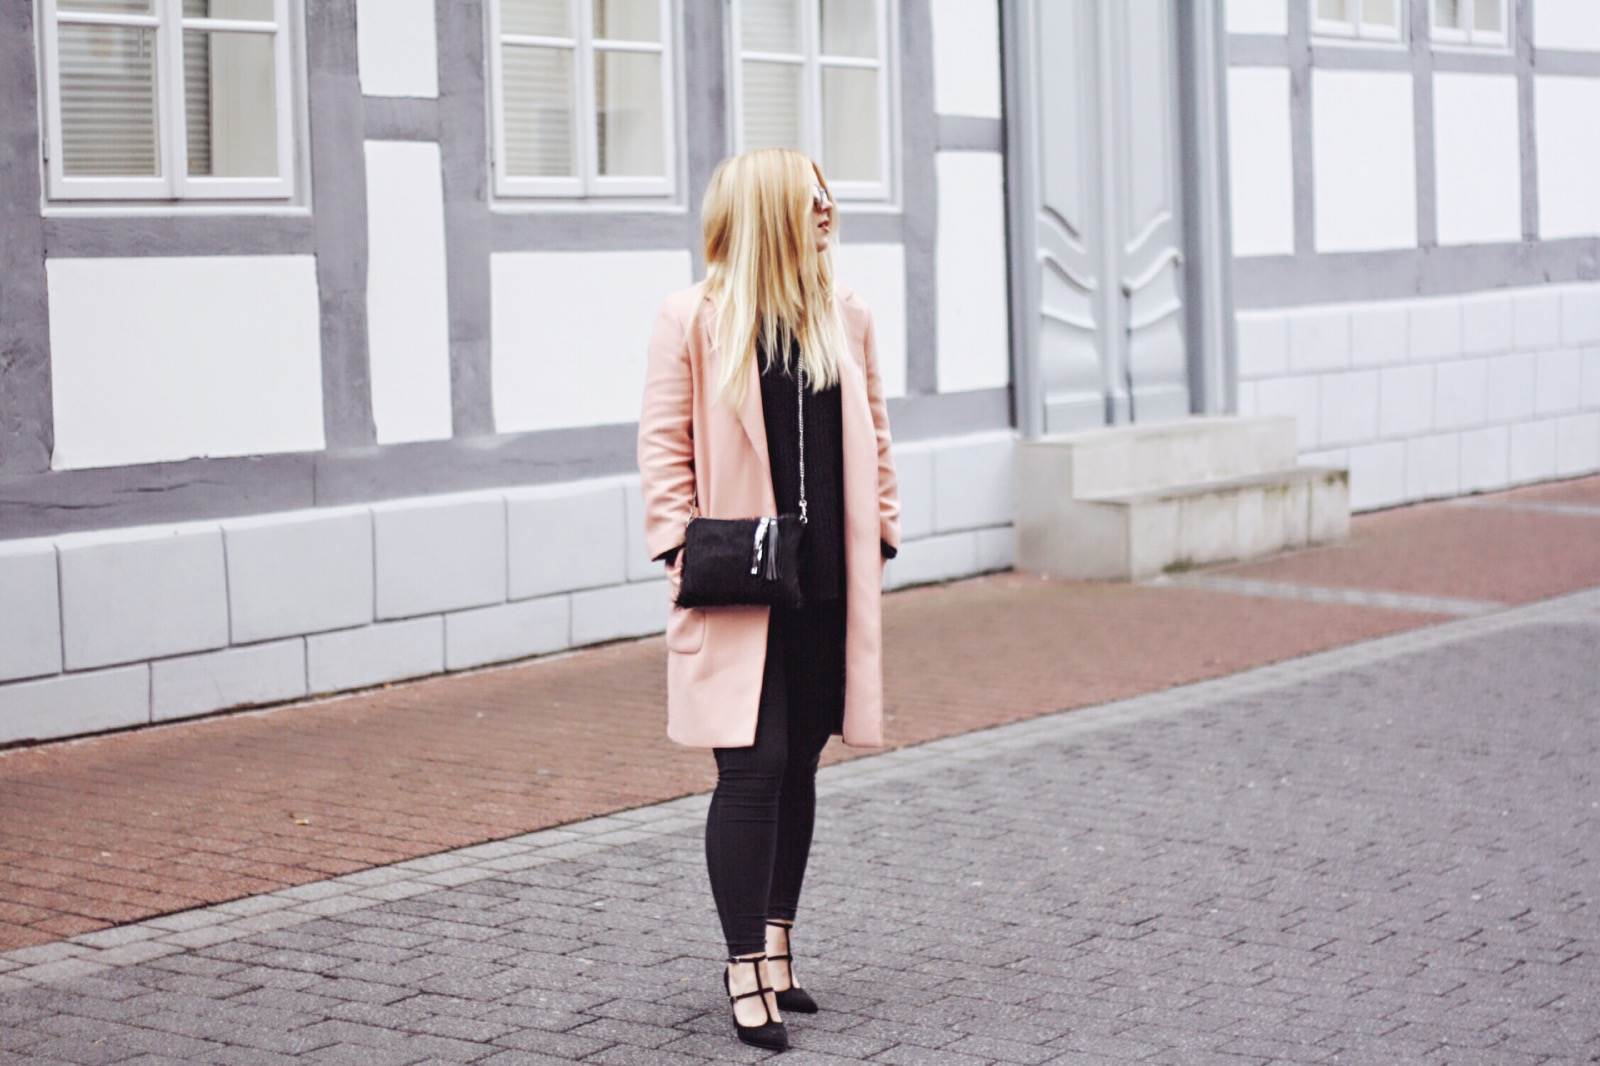 itsgoldie_modeblogger_hannover_rosa_mantel_zara